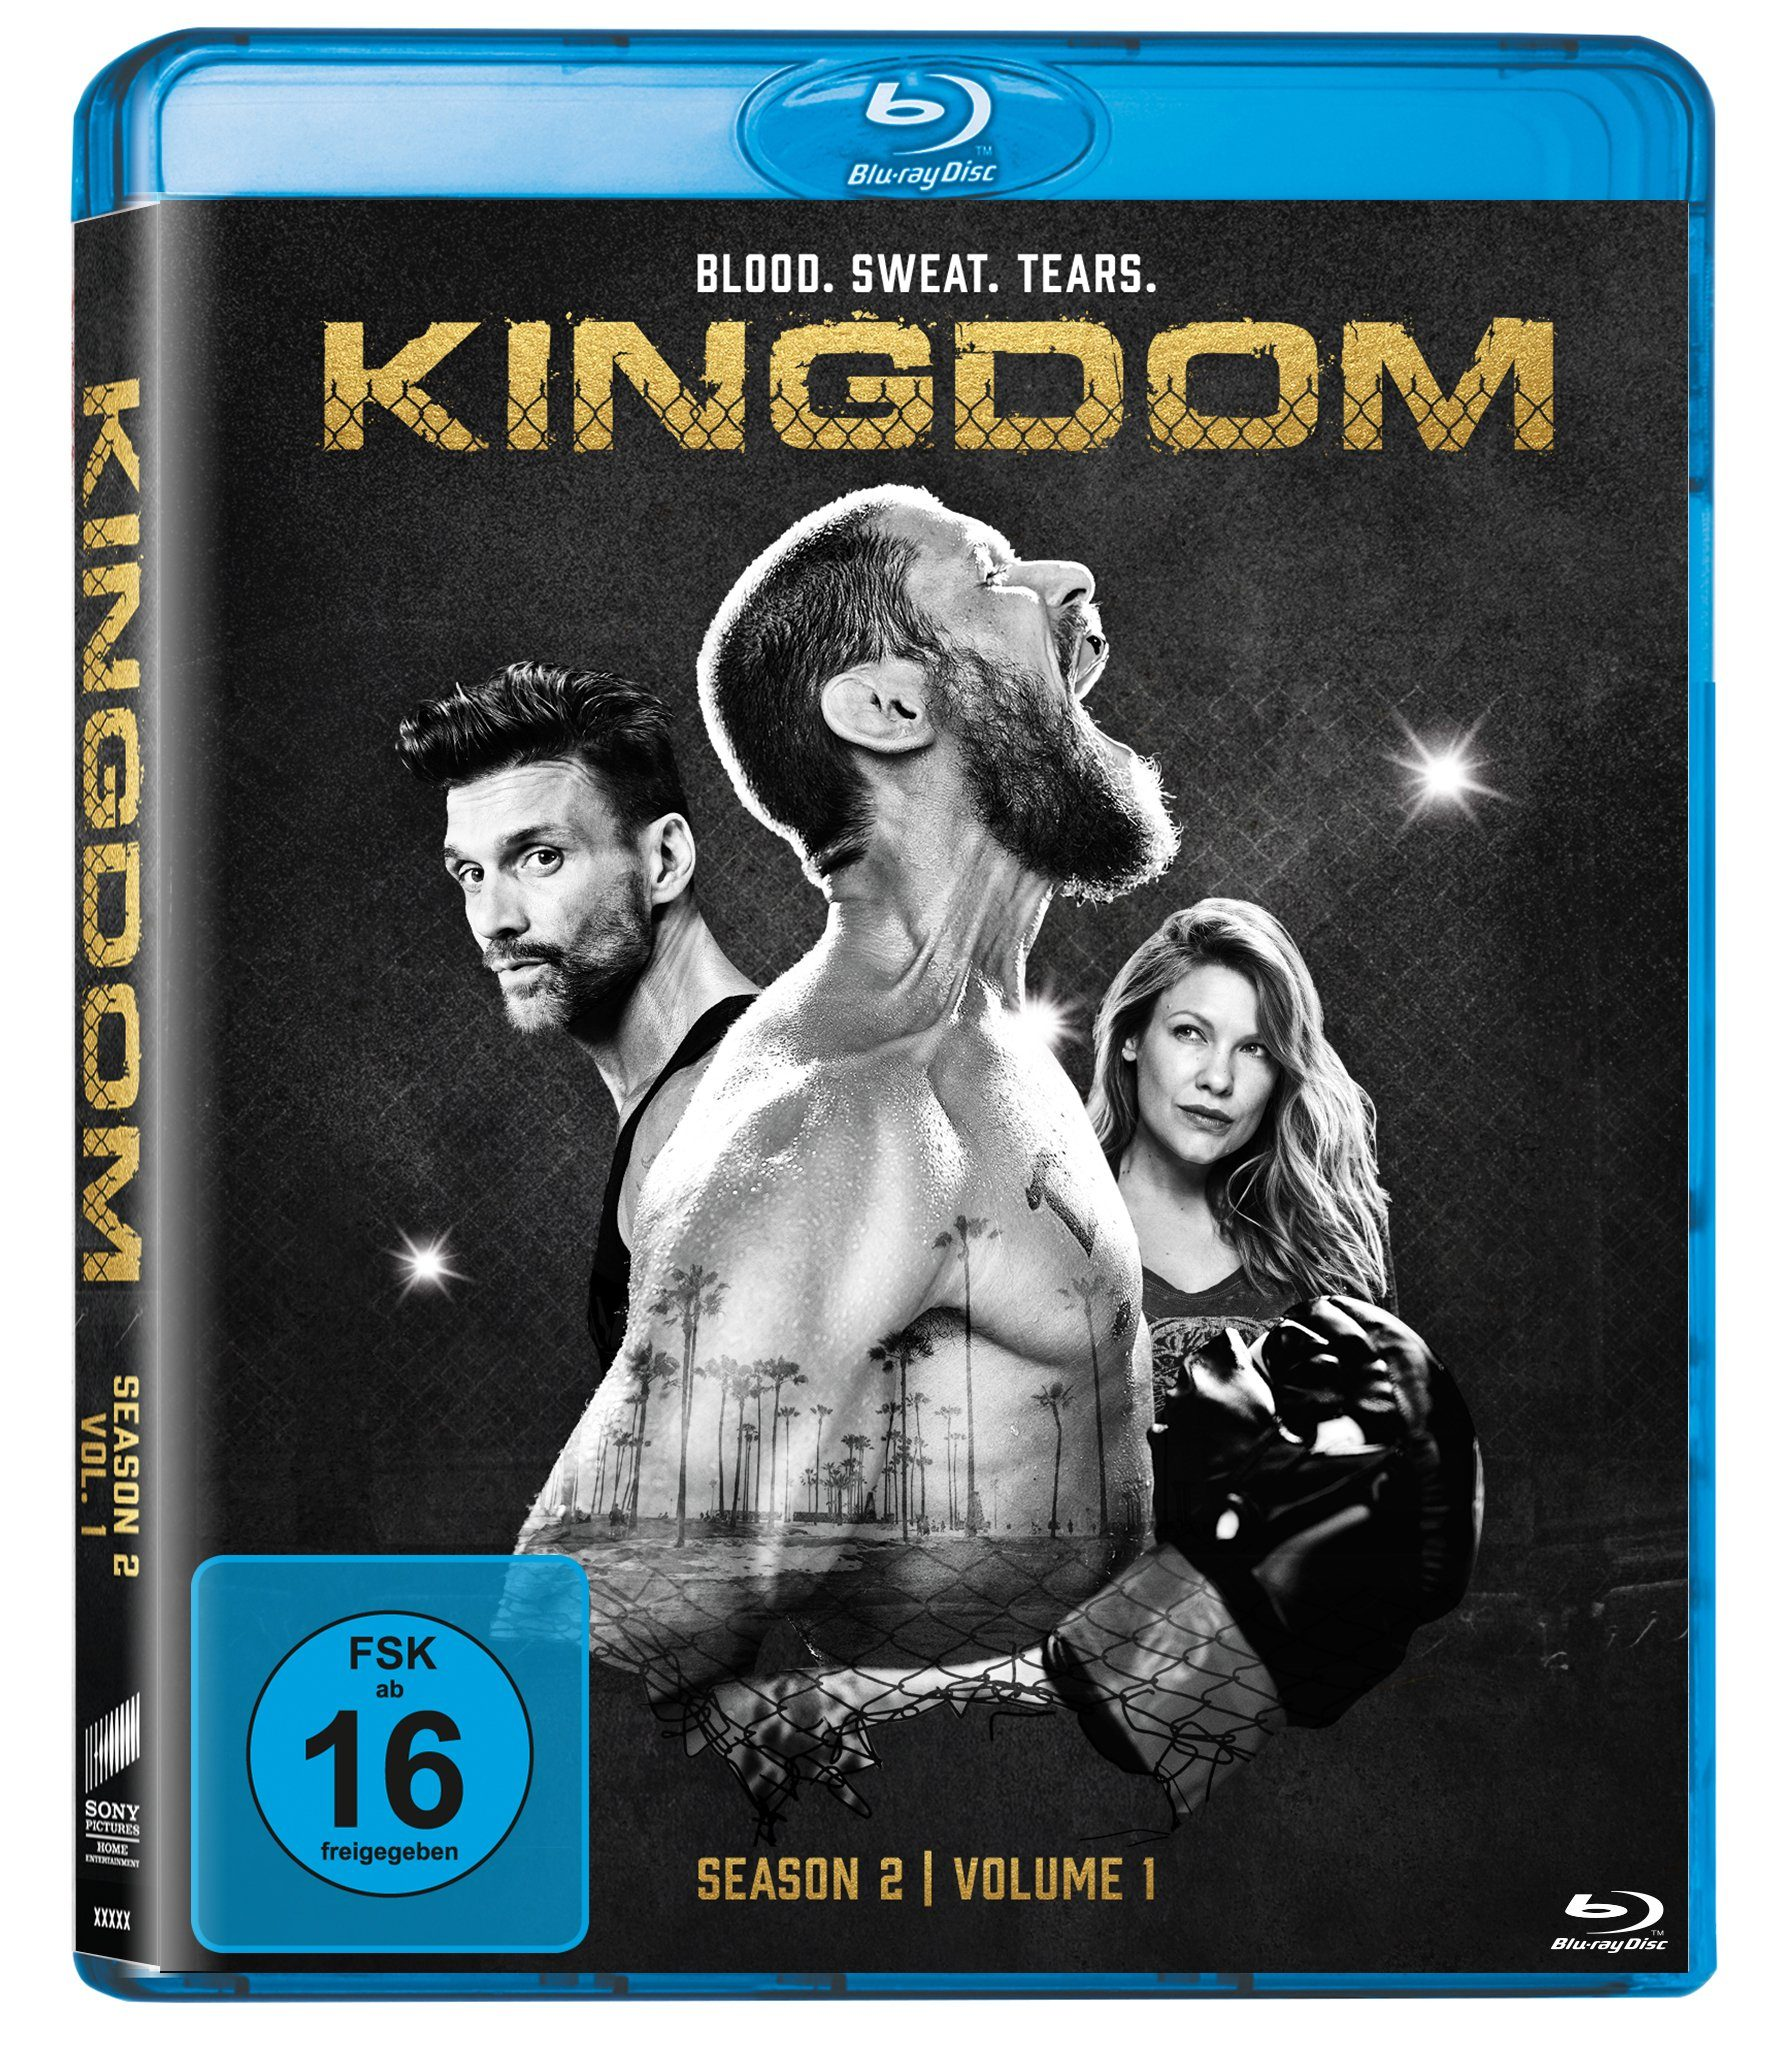 Sony Pictures Blu-ray »Kingdom - Season 2 Vol. 1«